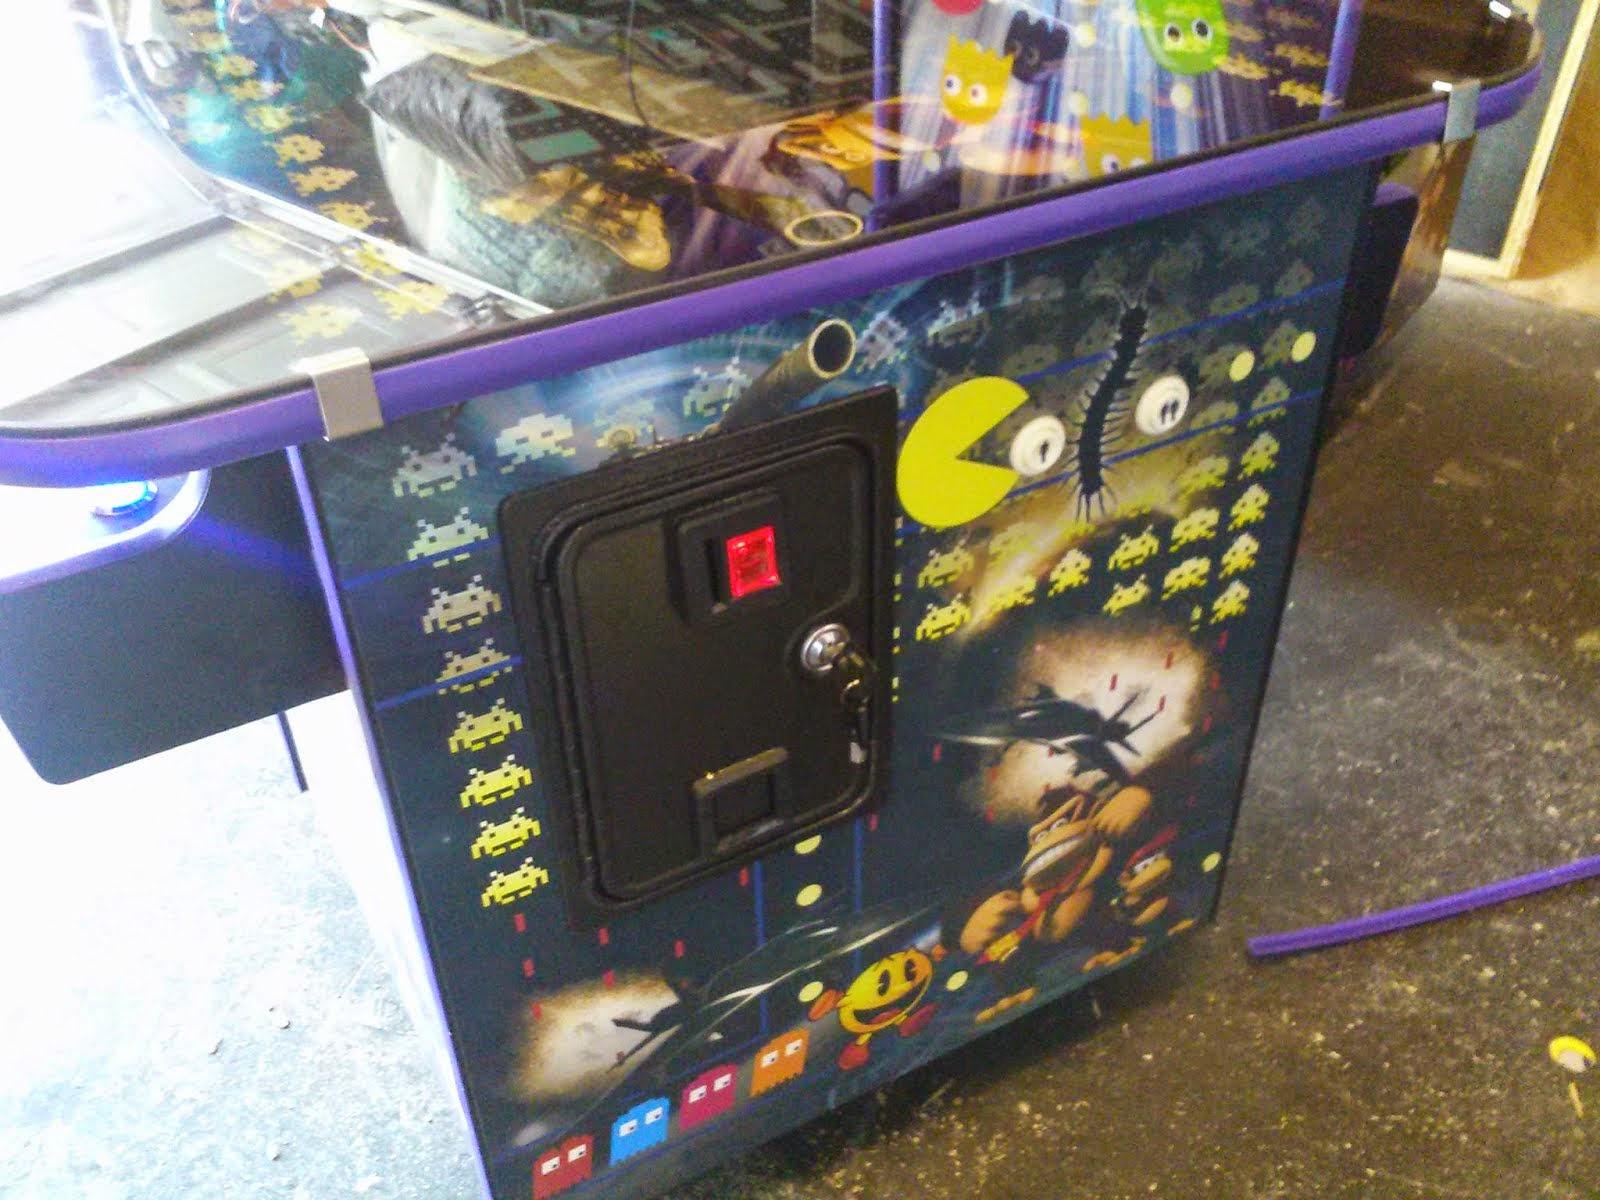 Coctail Arcade